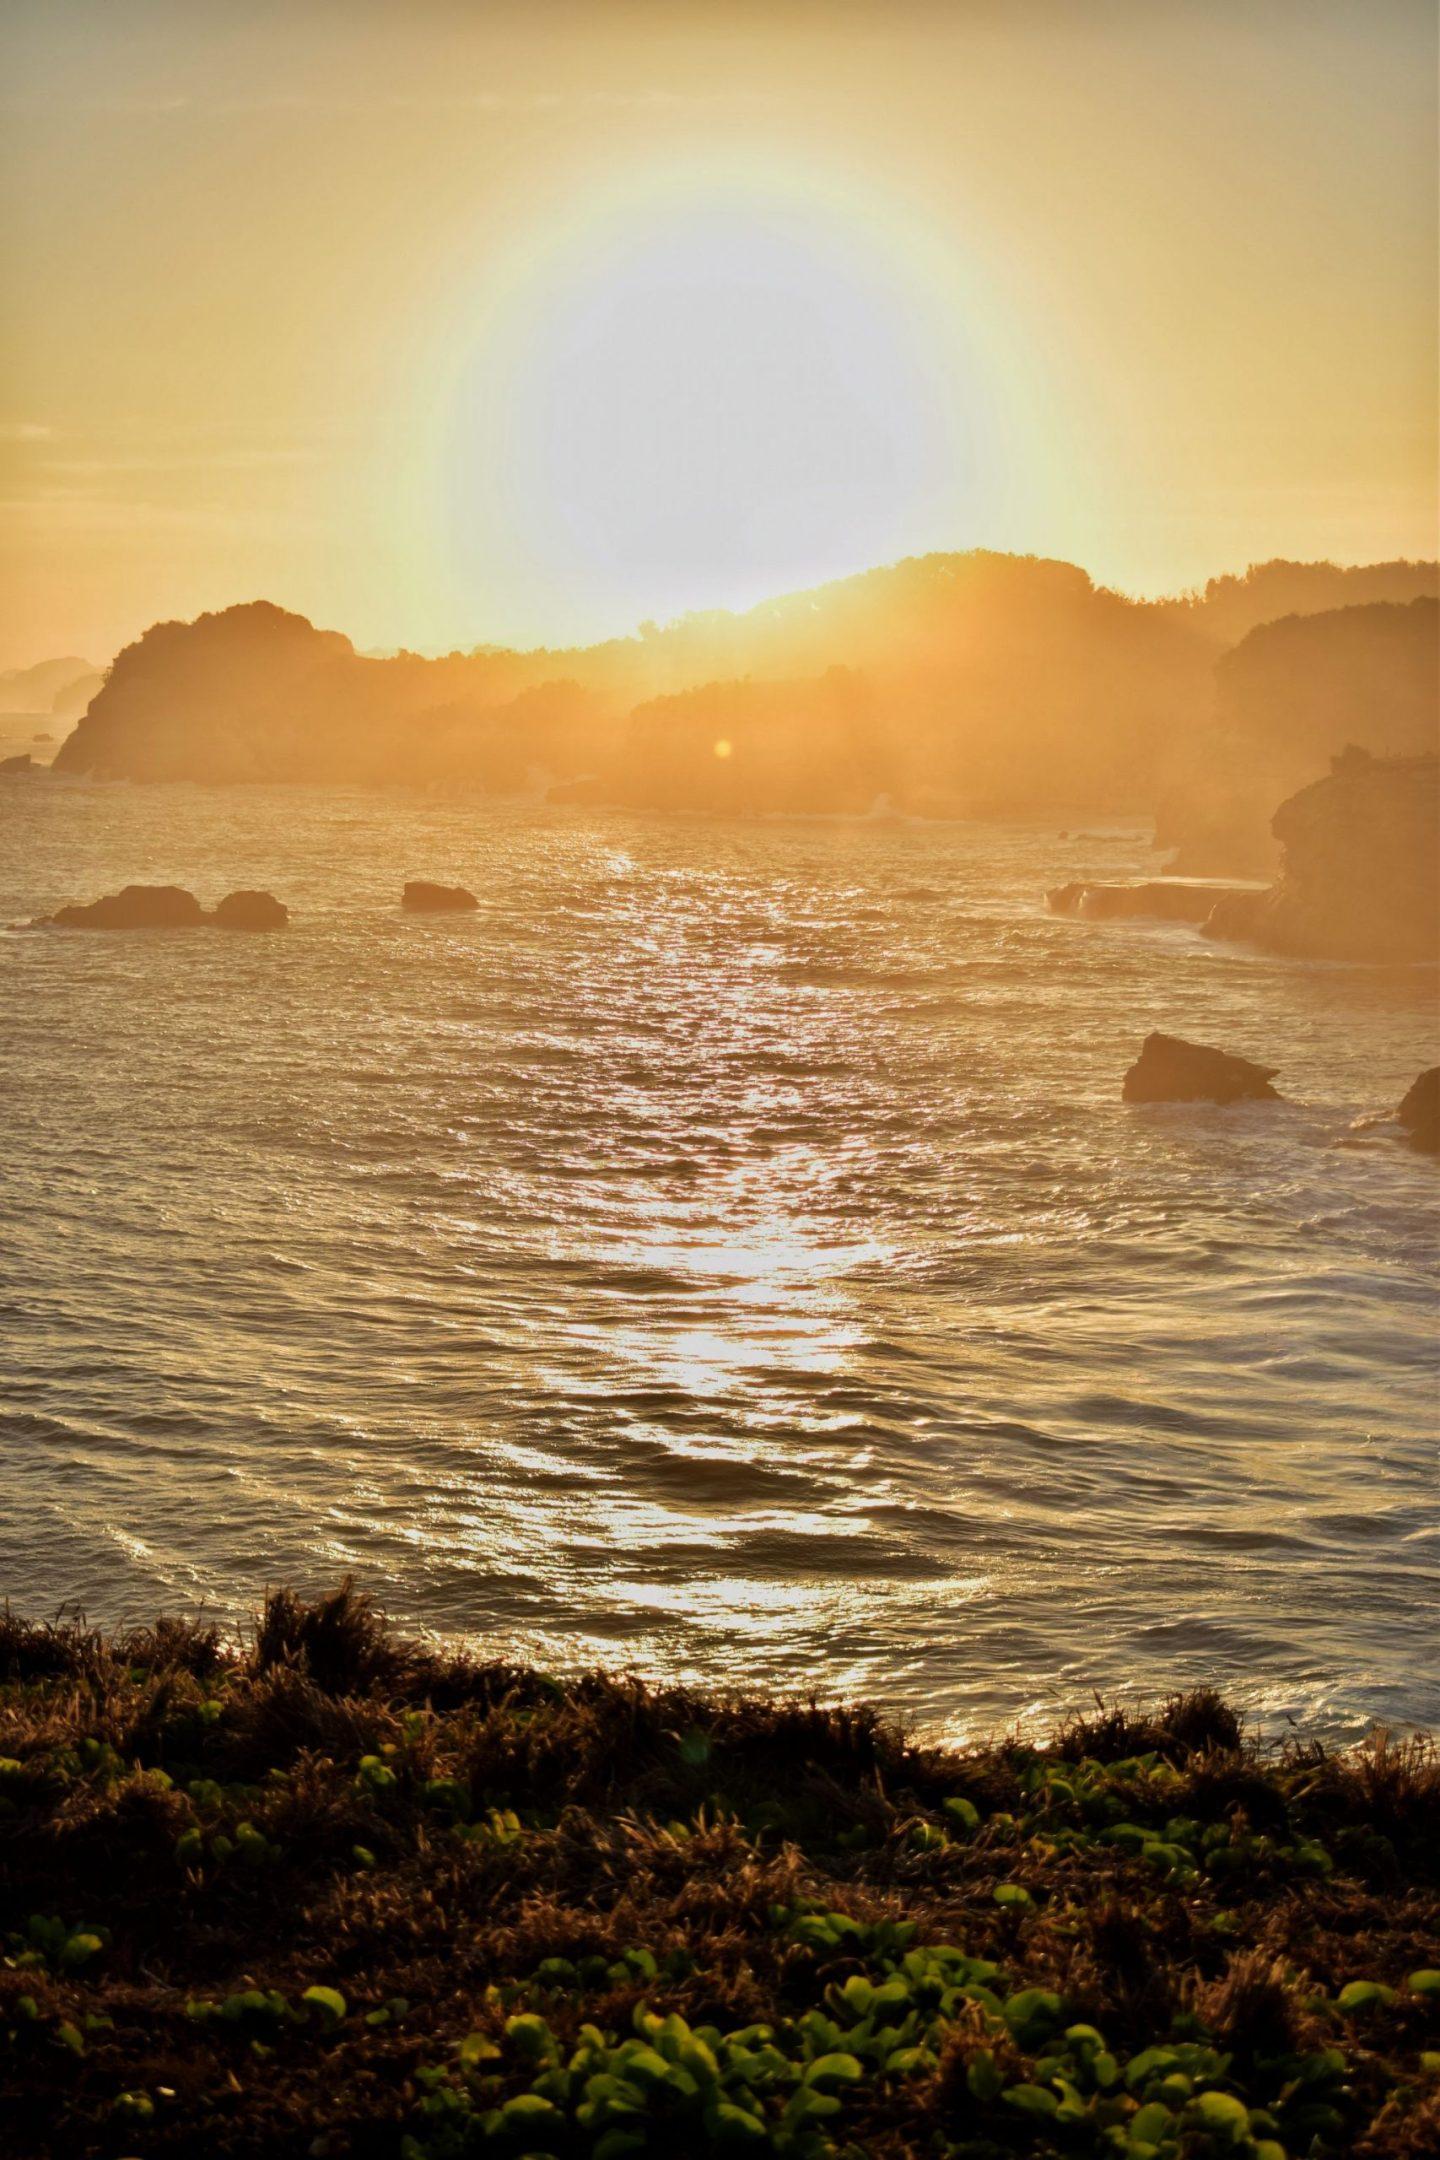 Benefits of Vitamin D/Getting Sunlight